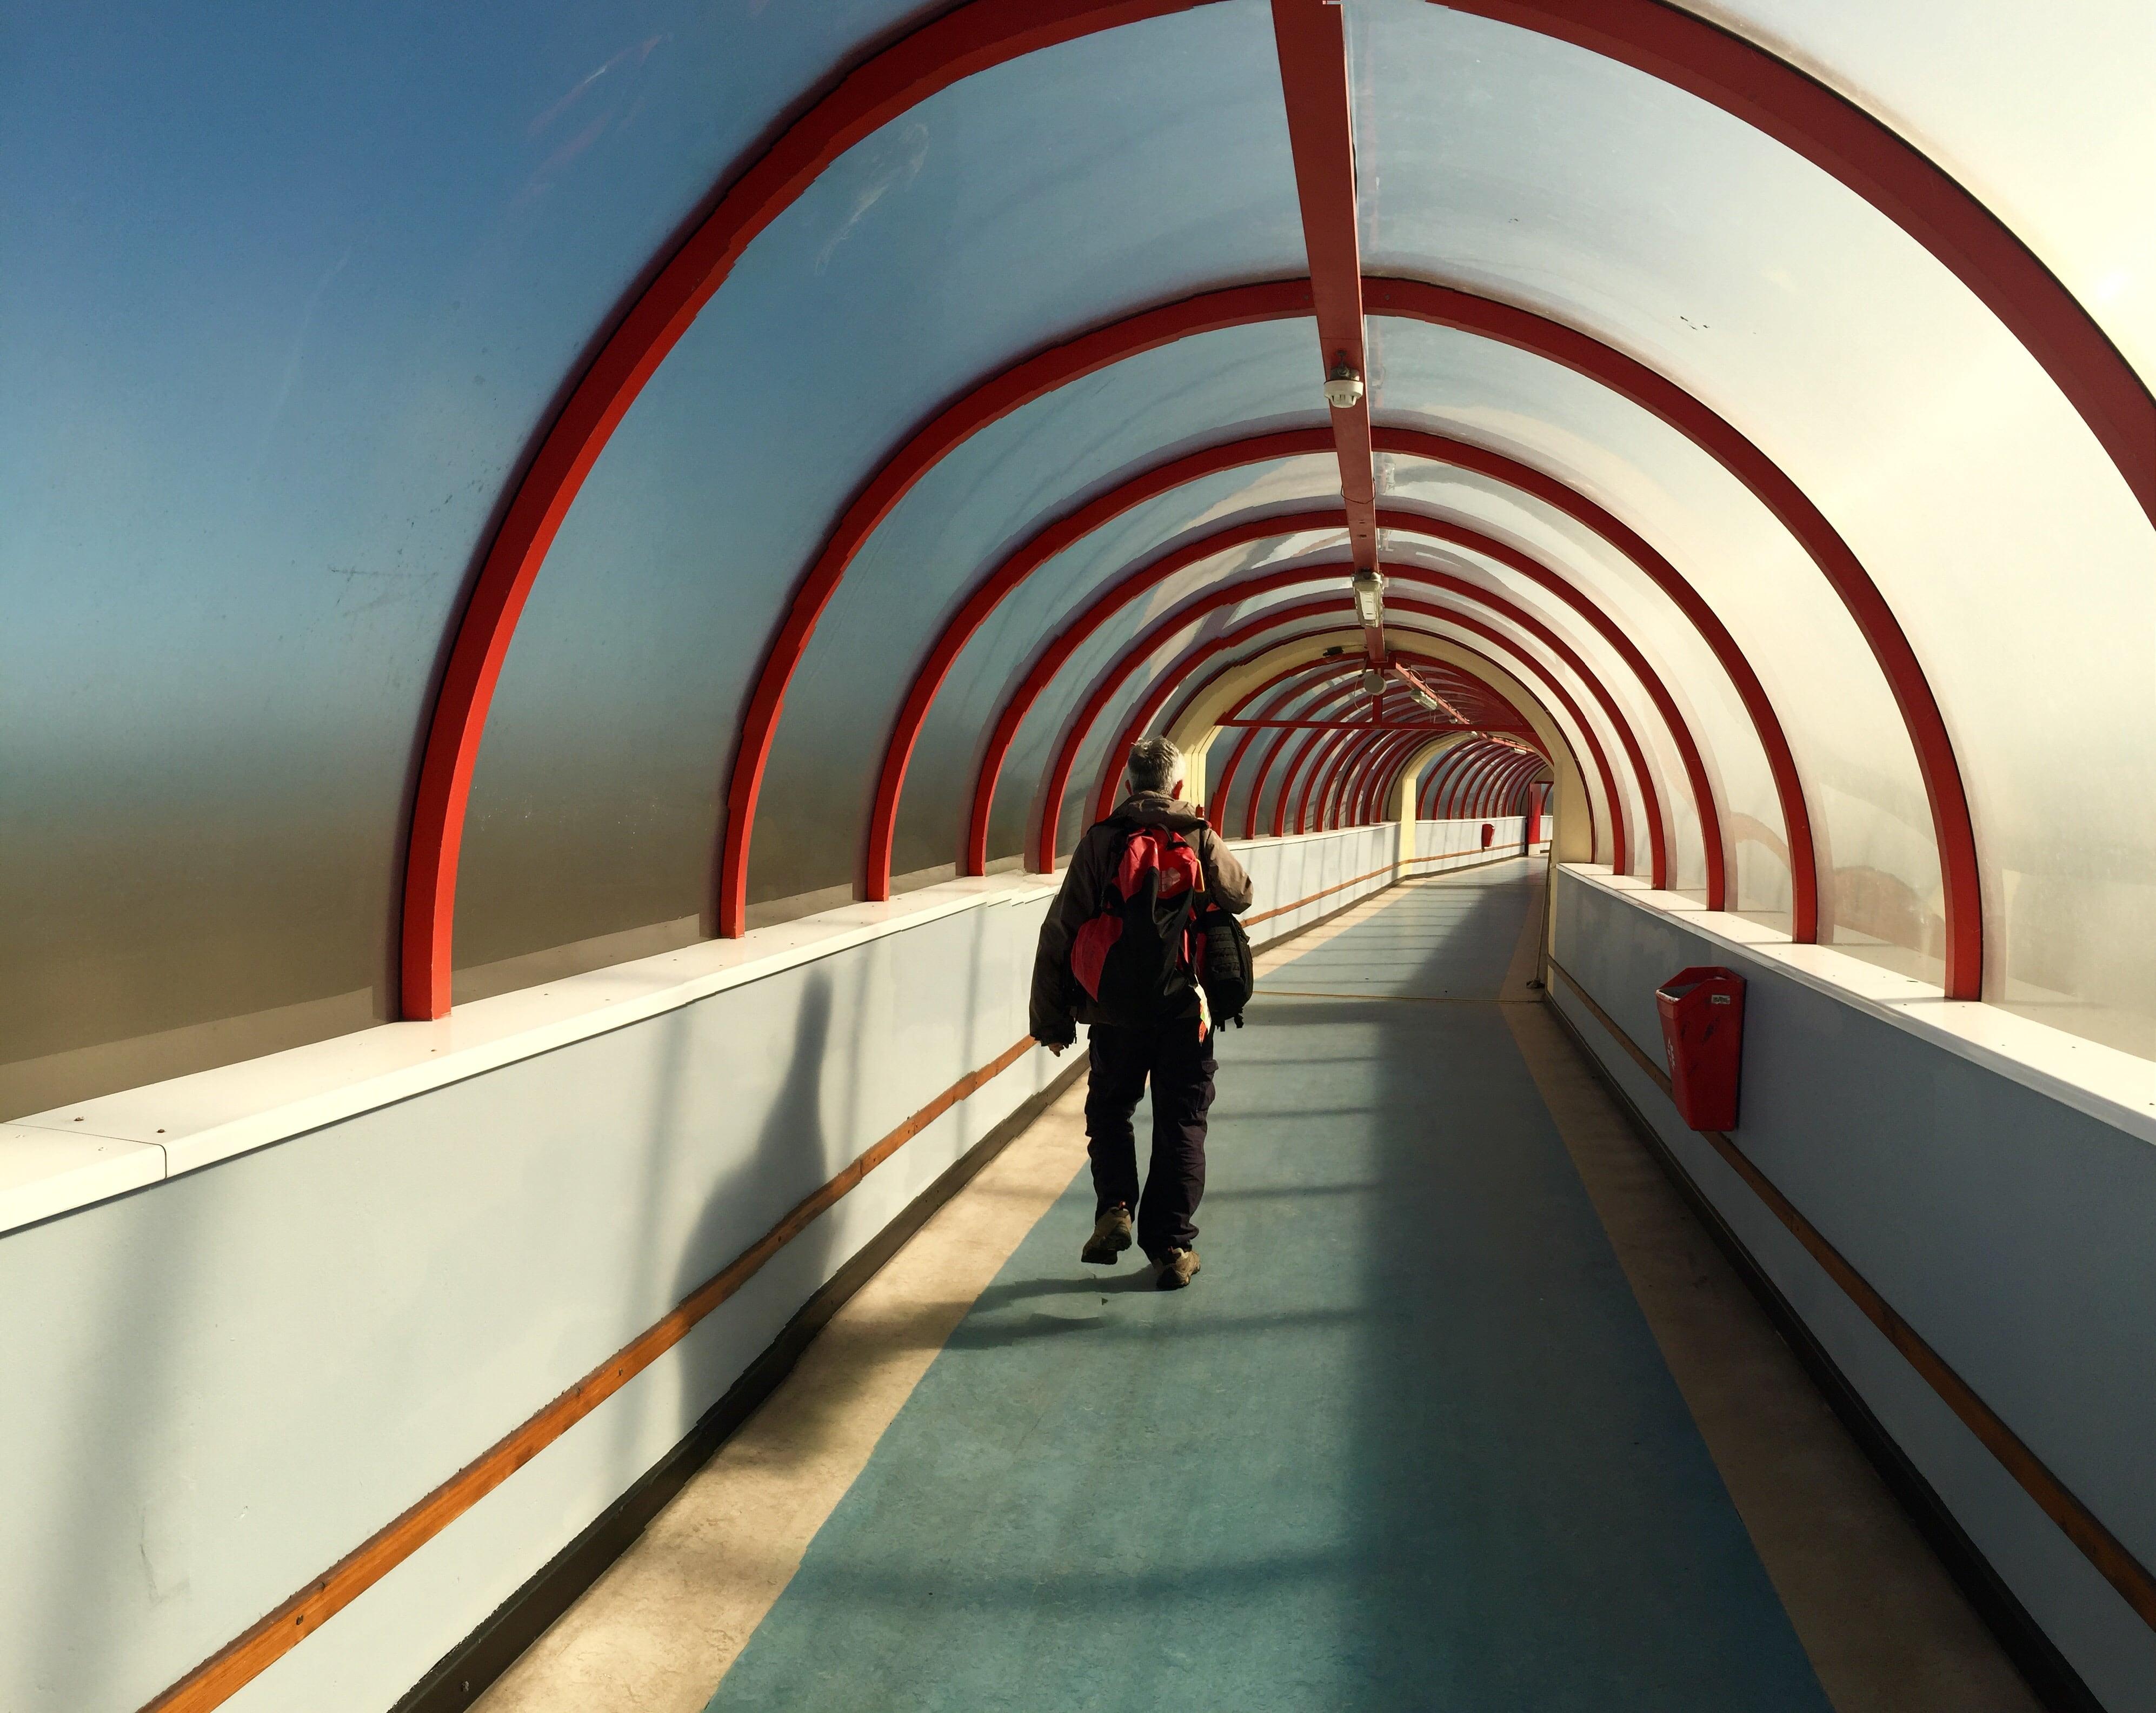 Man in Tunnel - Evie - Runner Up Street (10)